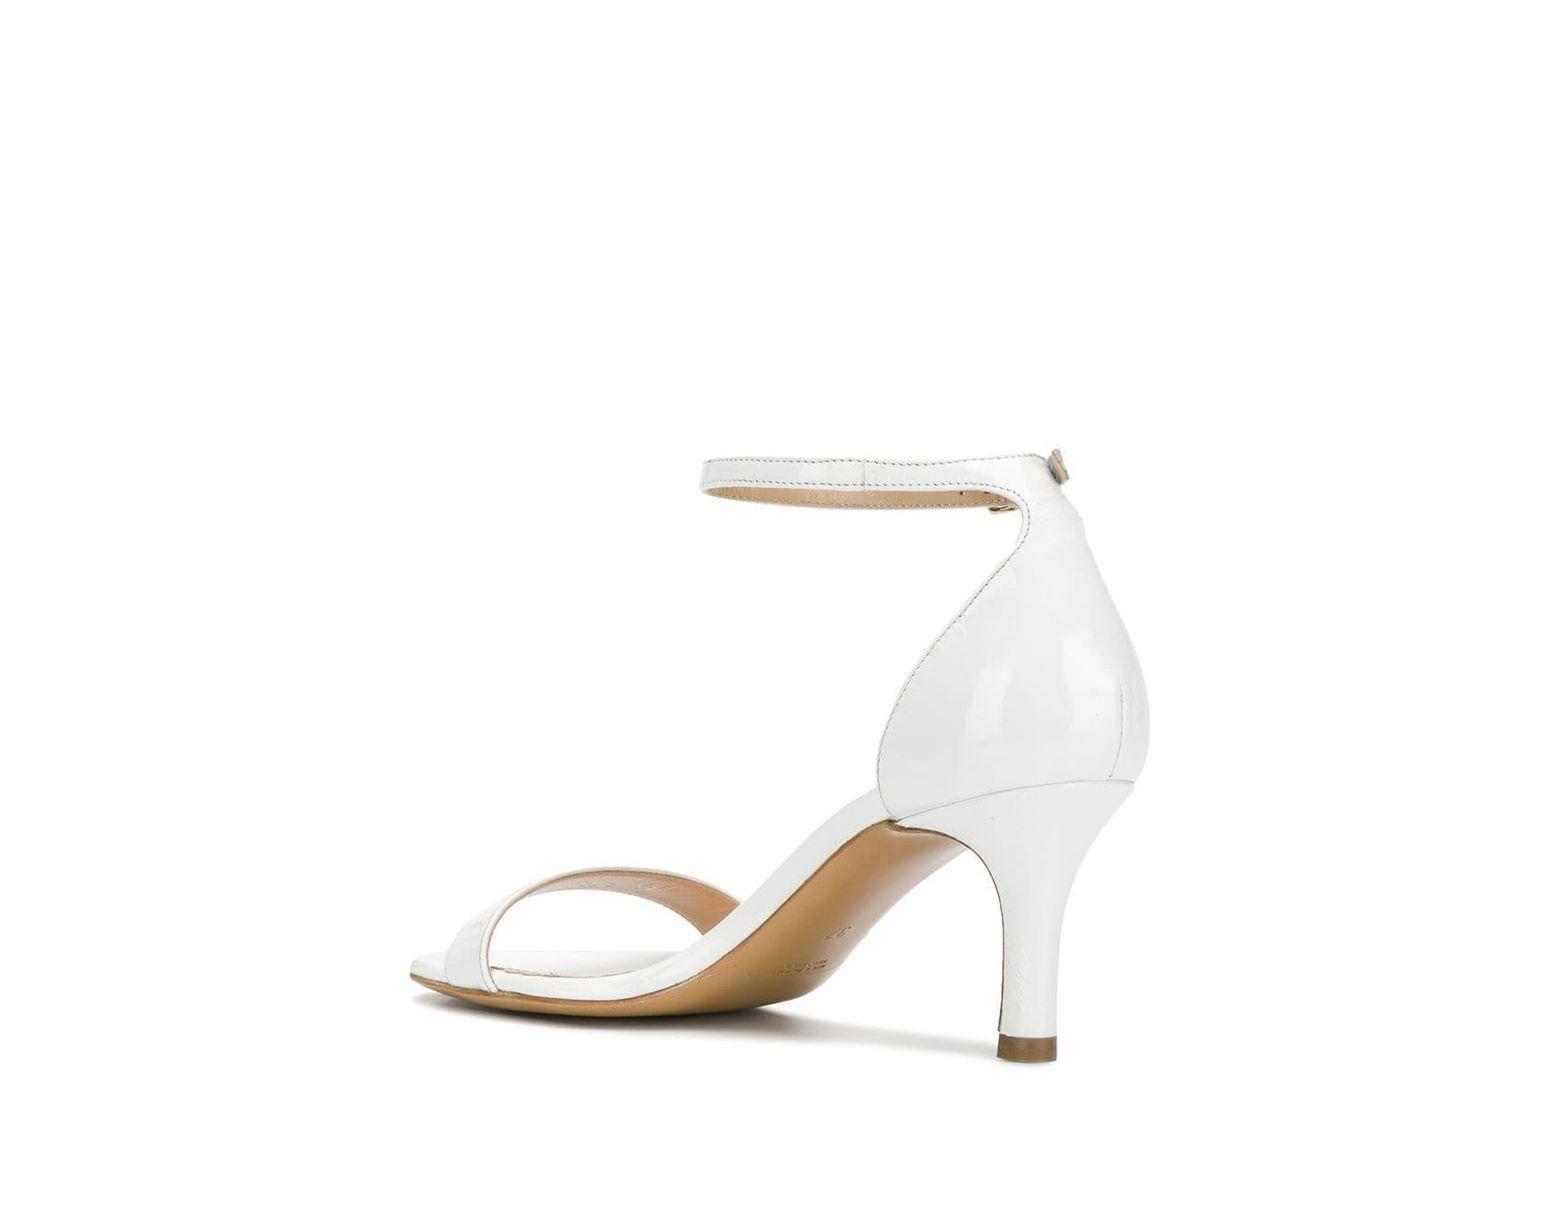 Antonio Barbato Heel In Mid White Givyybf76 Sandals Lyst hQdtrs